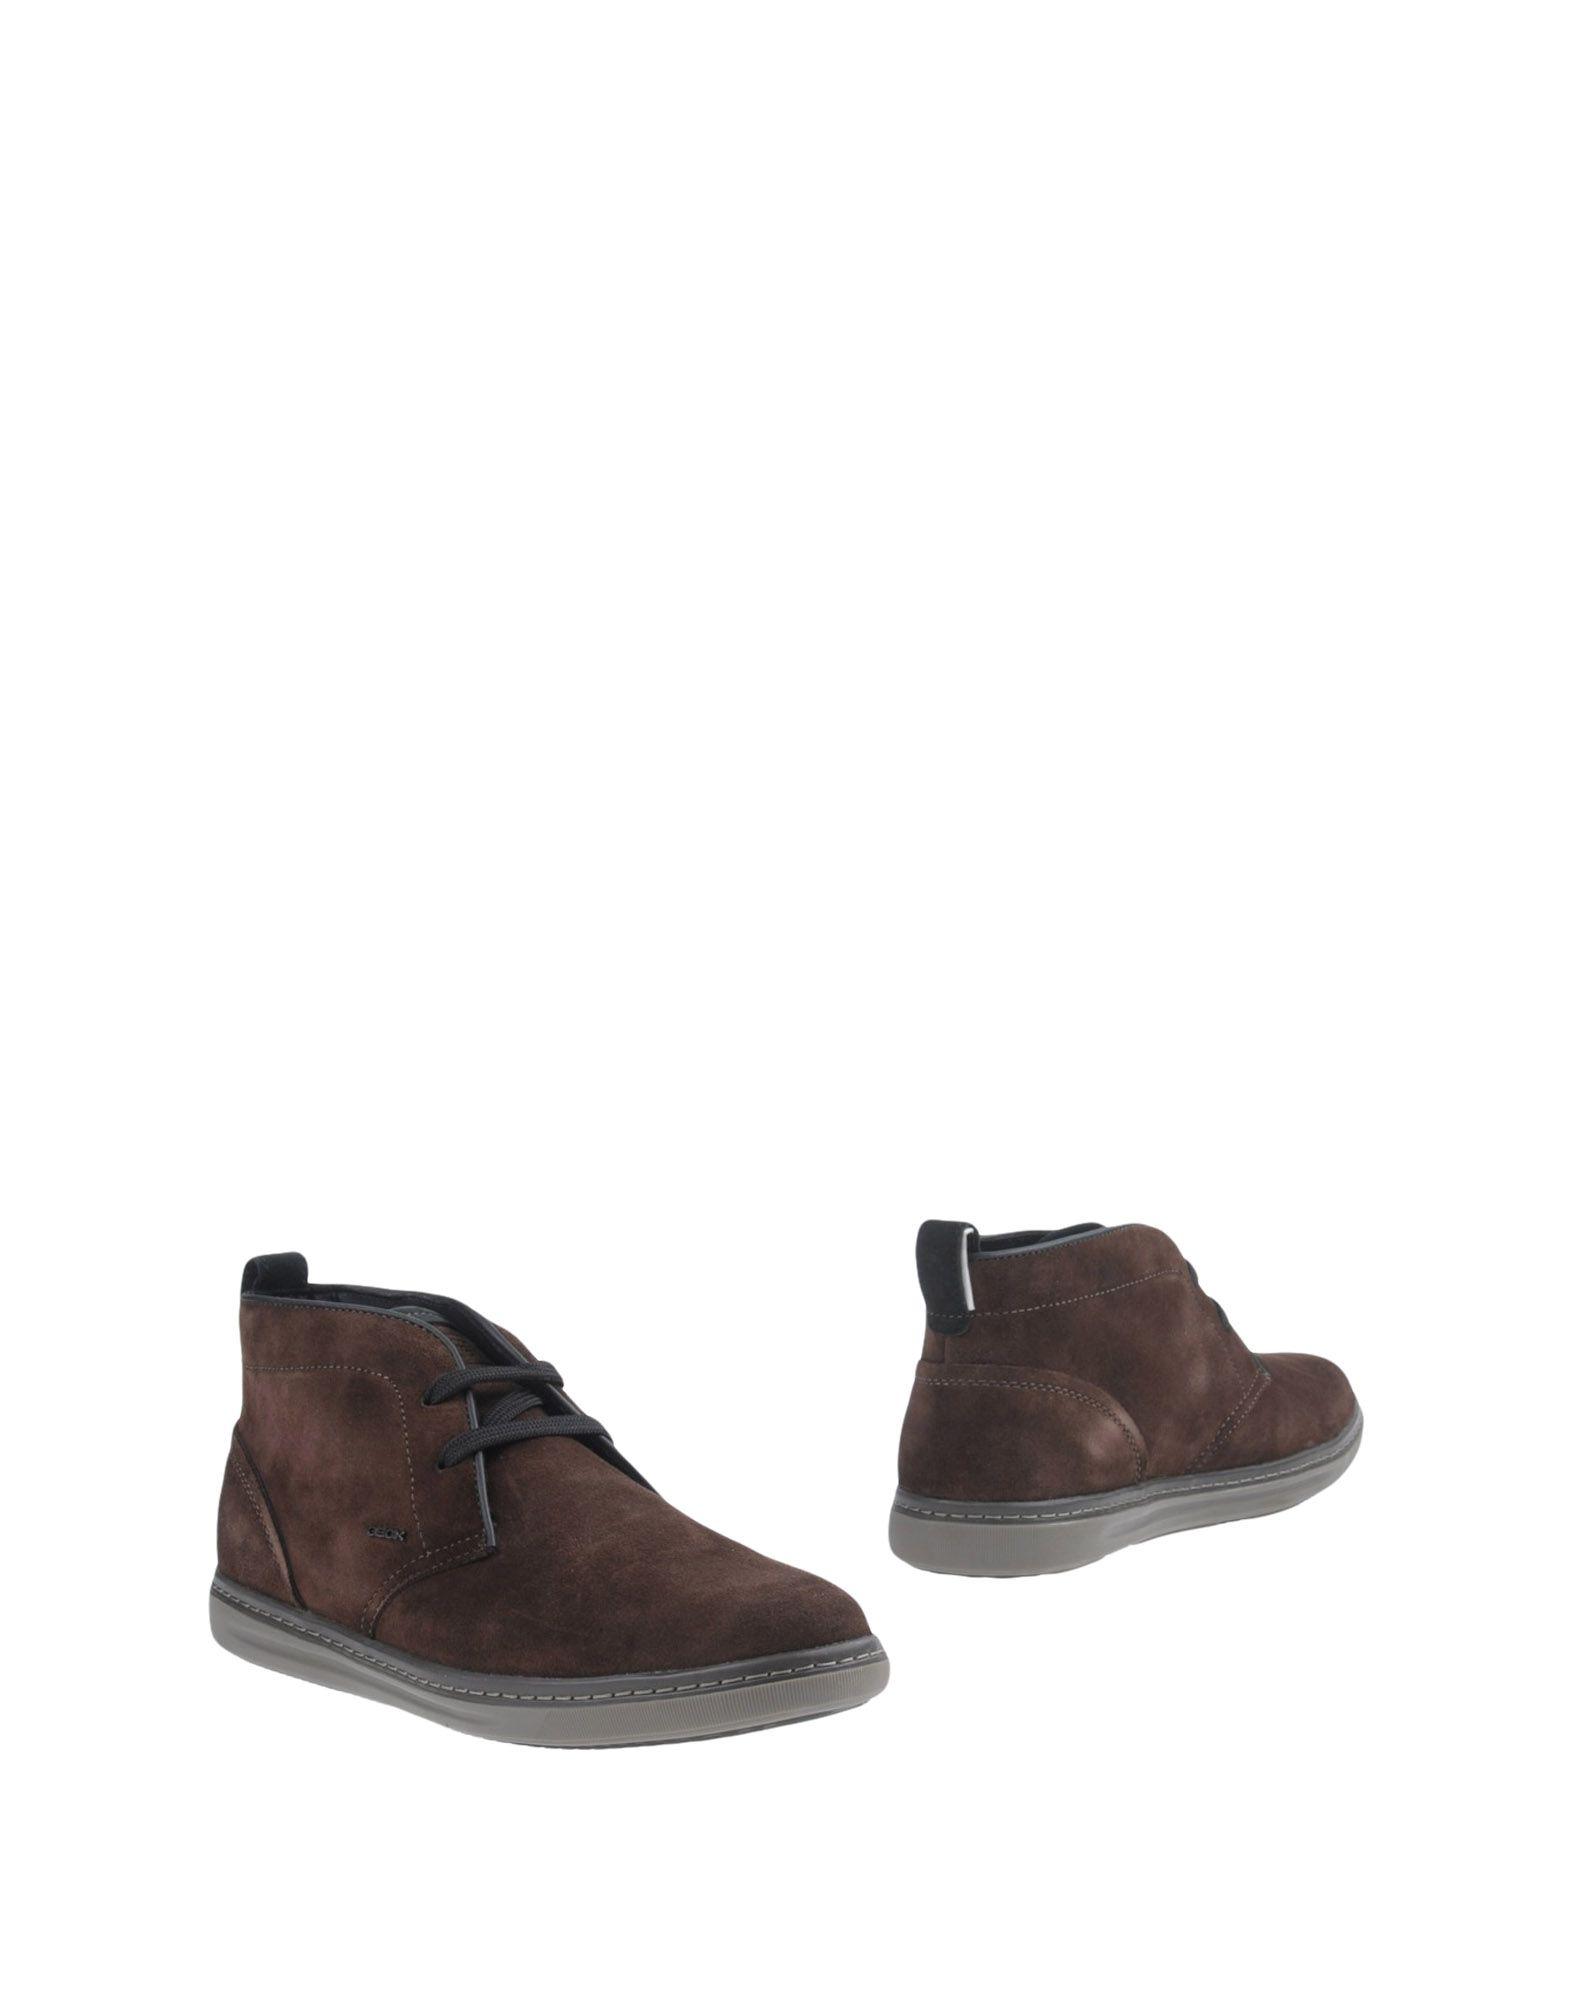 Geox  Stiefelette Herren  Geox 11391195MO Heiße Schuhe f7cb4c